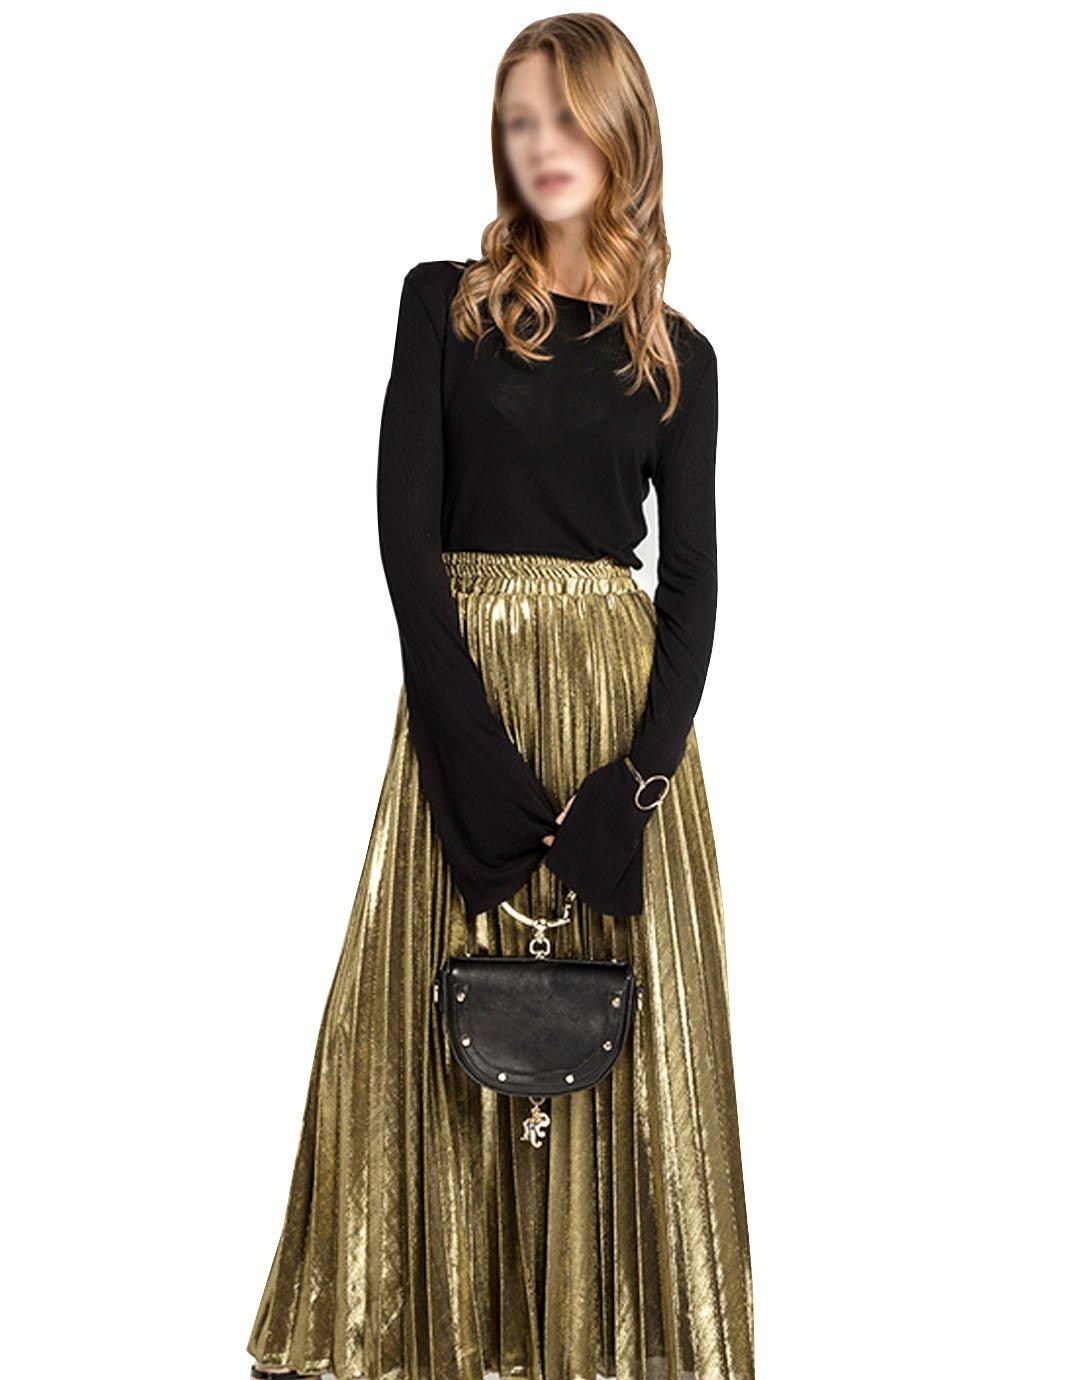 Sherry Skirts Women Summer Midi Skirt Metallic Elastic Long Pleated Skirt Shiny Shimmer A Line High Waist Skirts (Gold,L)